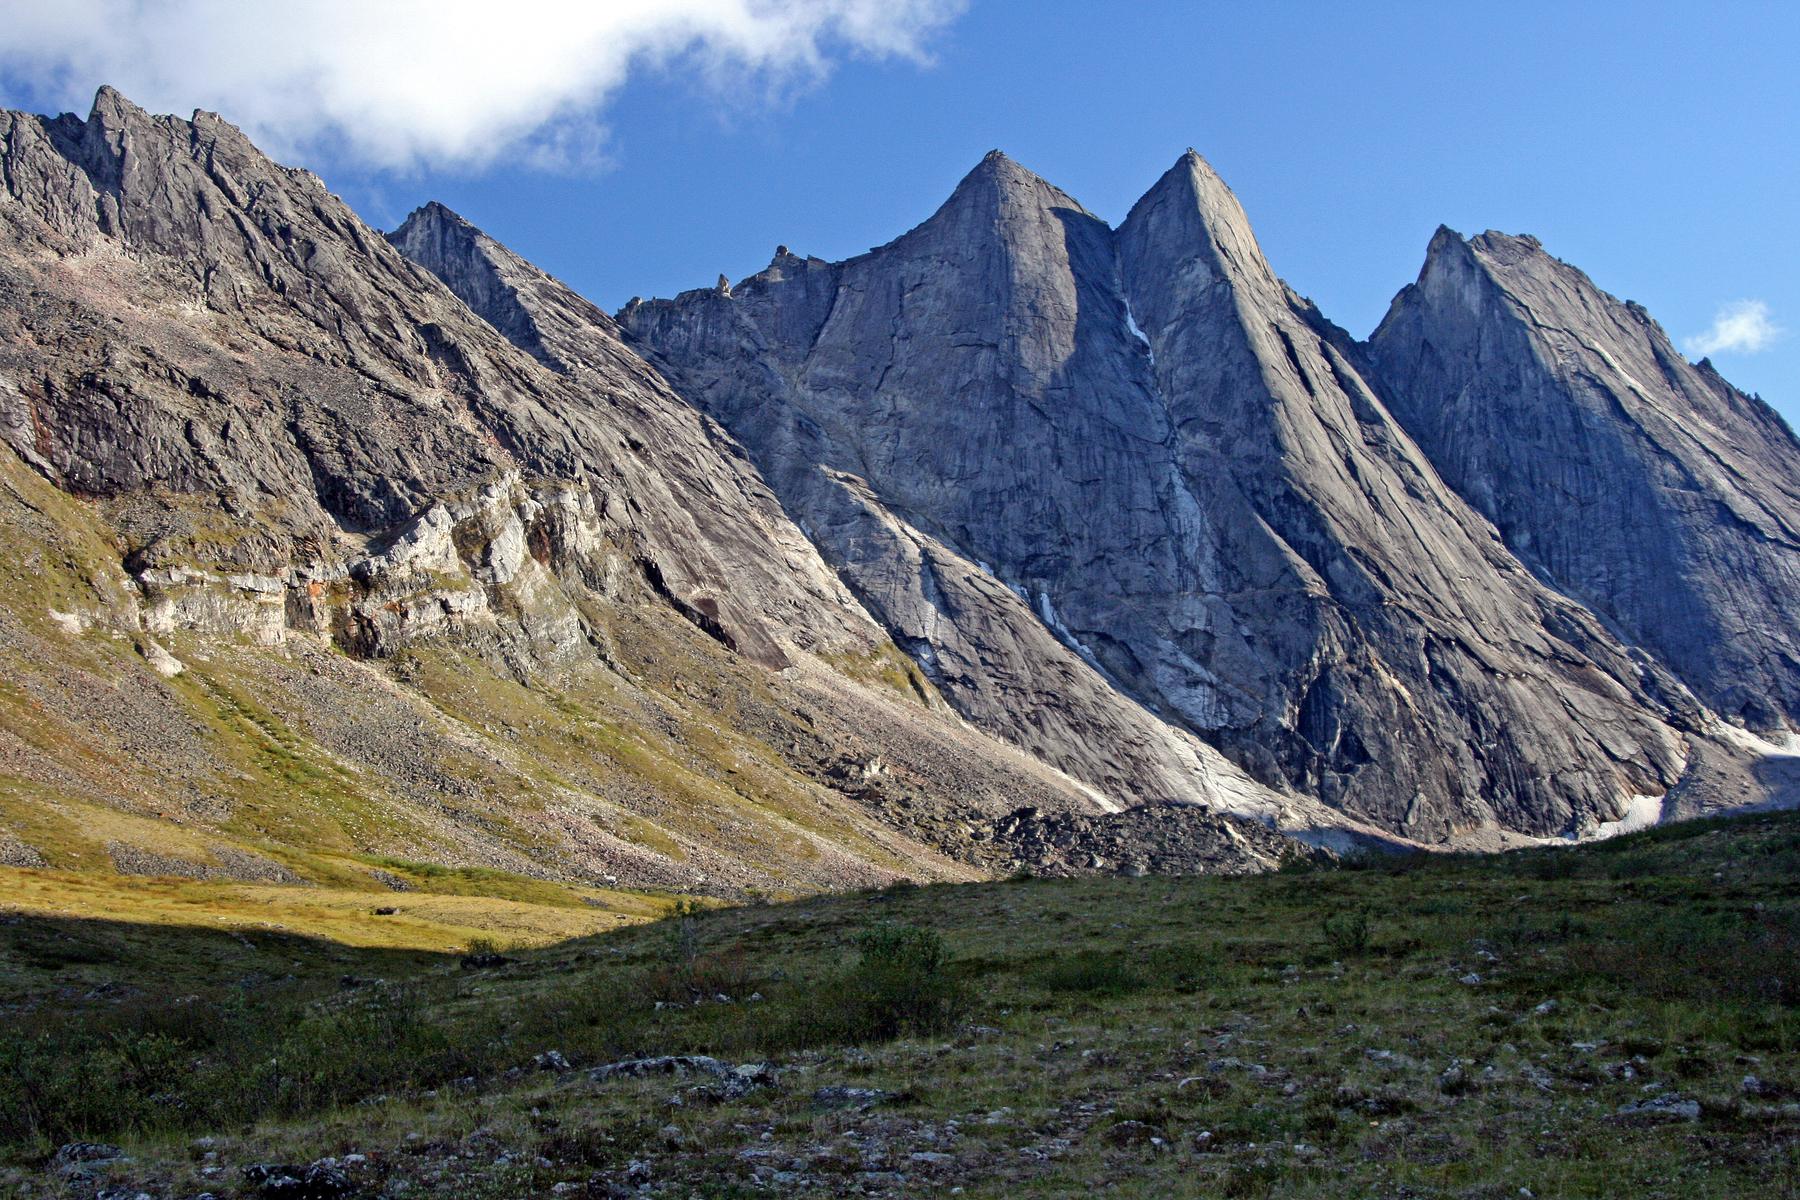 granite spires of the Arrigetch Peaks, Gates of the Arctic National Park, Alaska